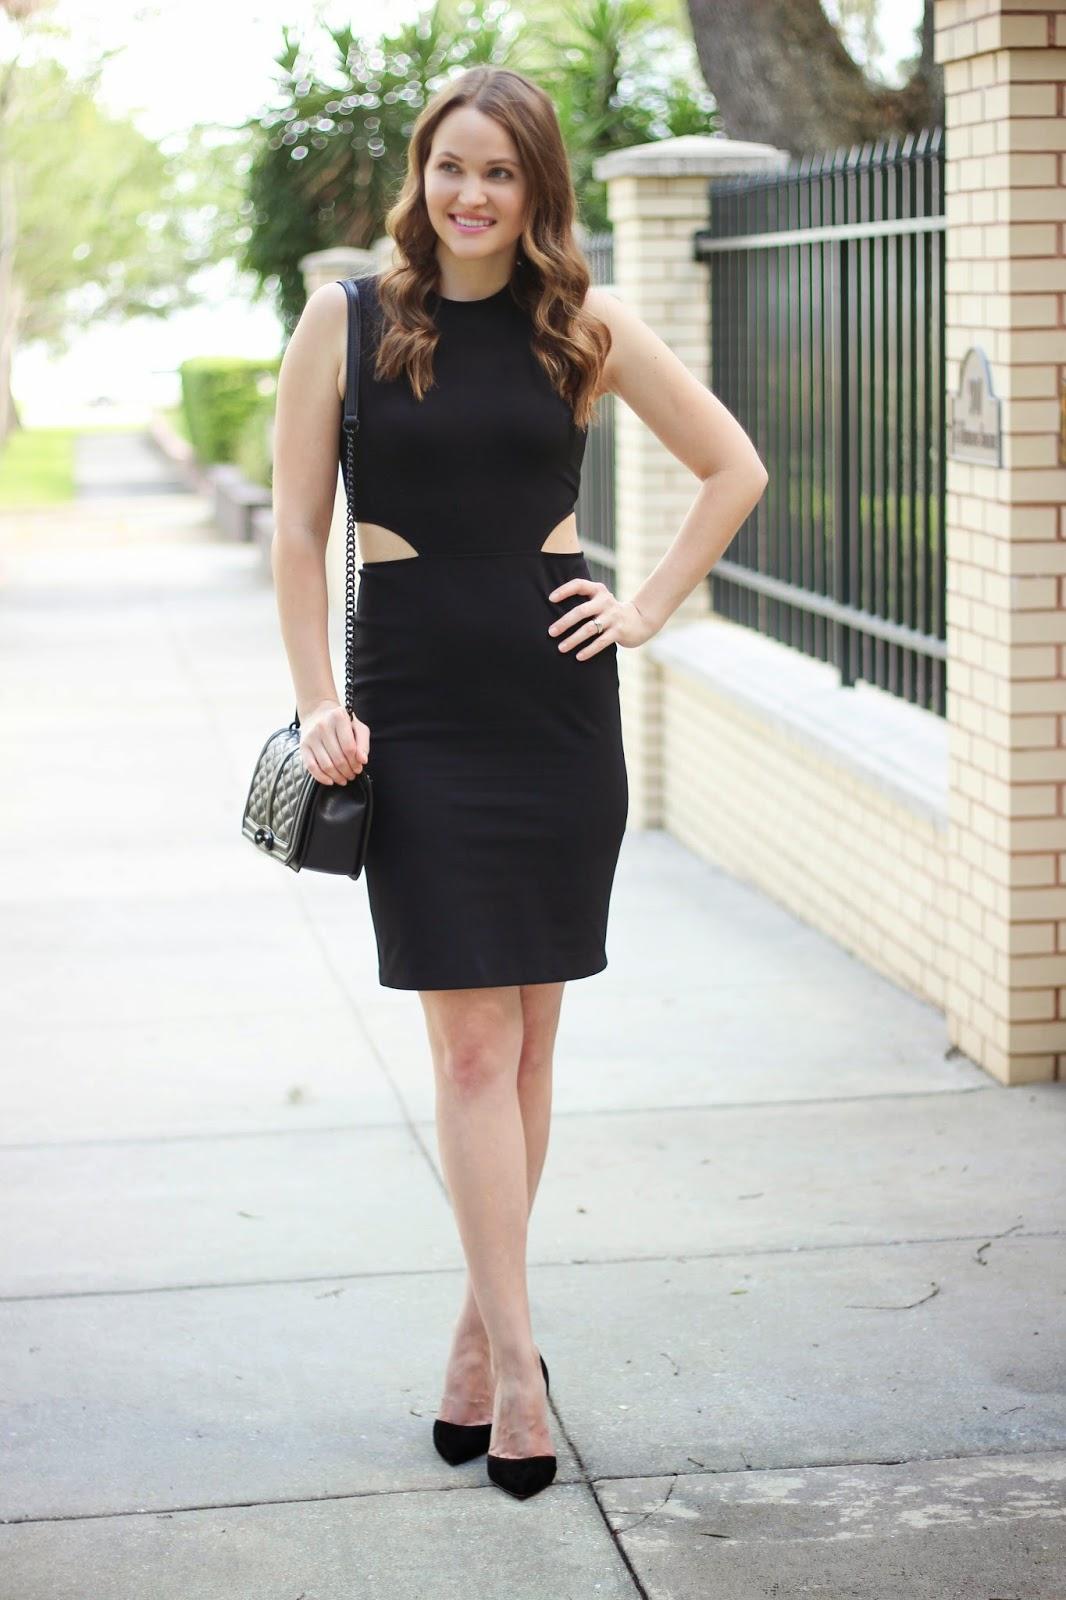 Kora Rae Andrea Dress Kelly Elizabeth Style